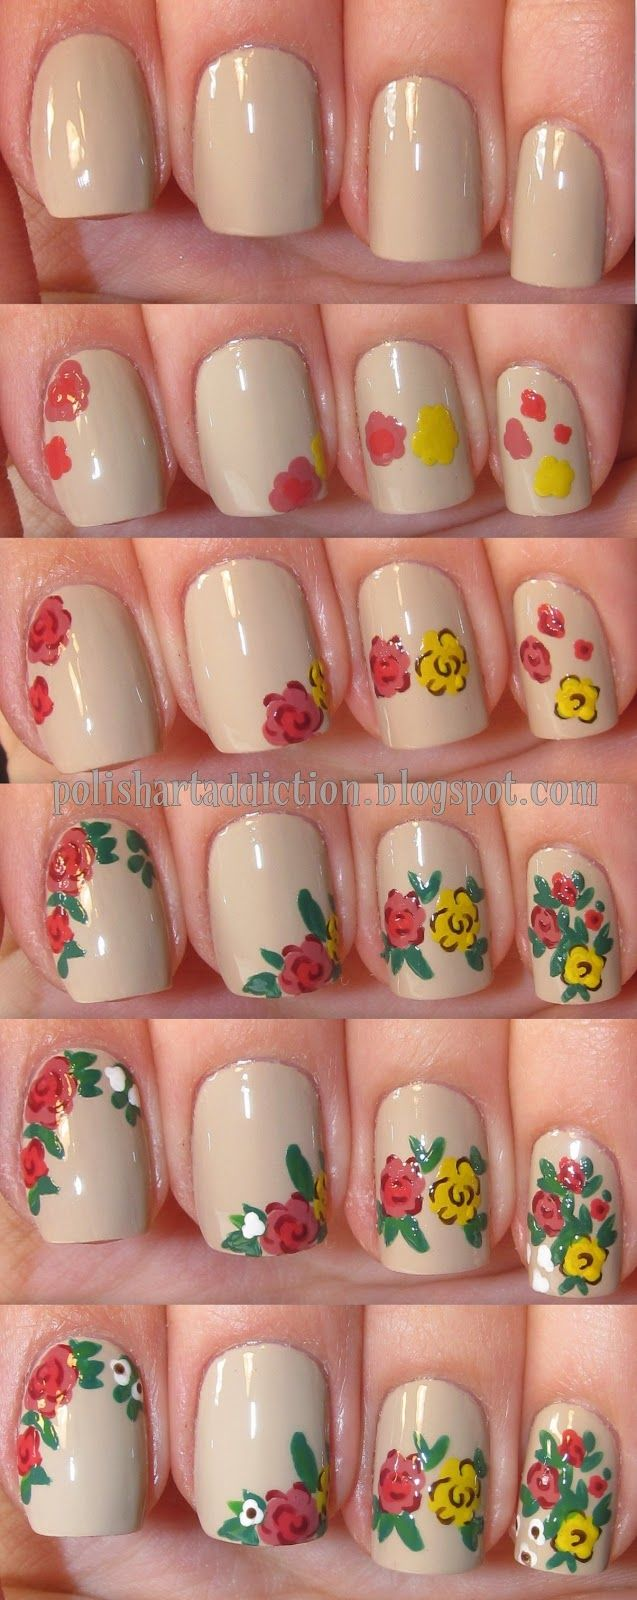 Pinned by www.SimpleNailArtTips.com TUTORIALS: NAIL ART DESIGN IDEAS -Polish Art Addiction: Vintage Floral